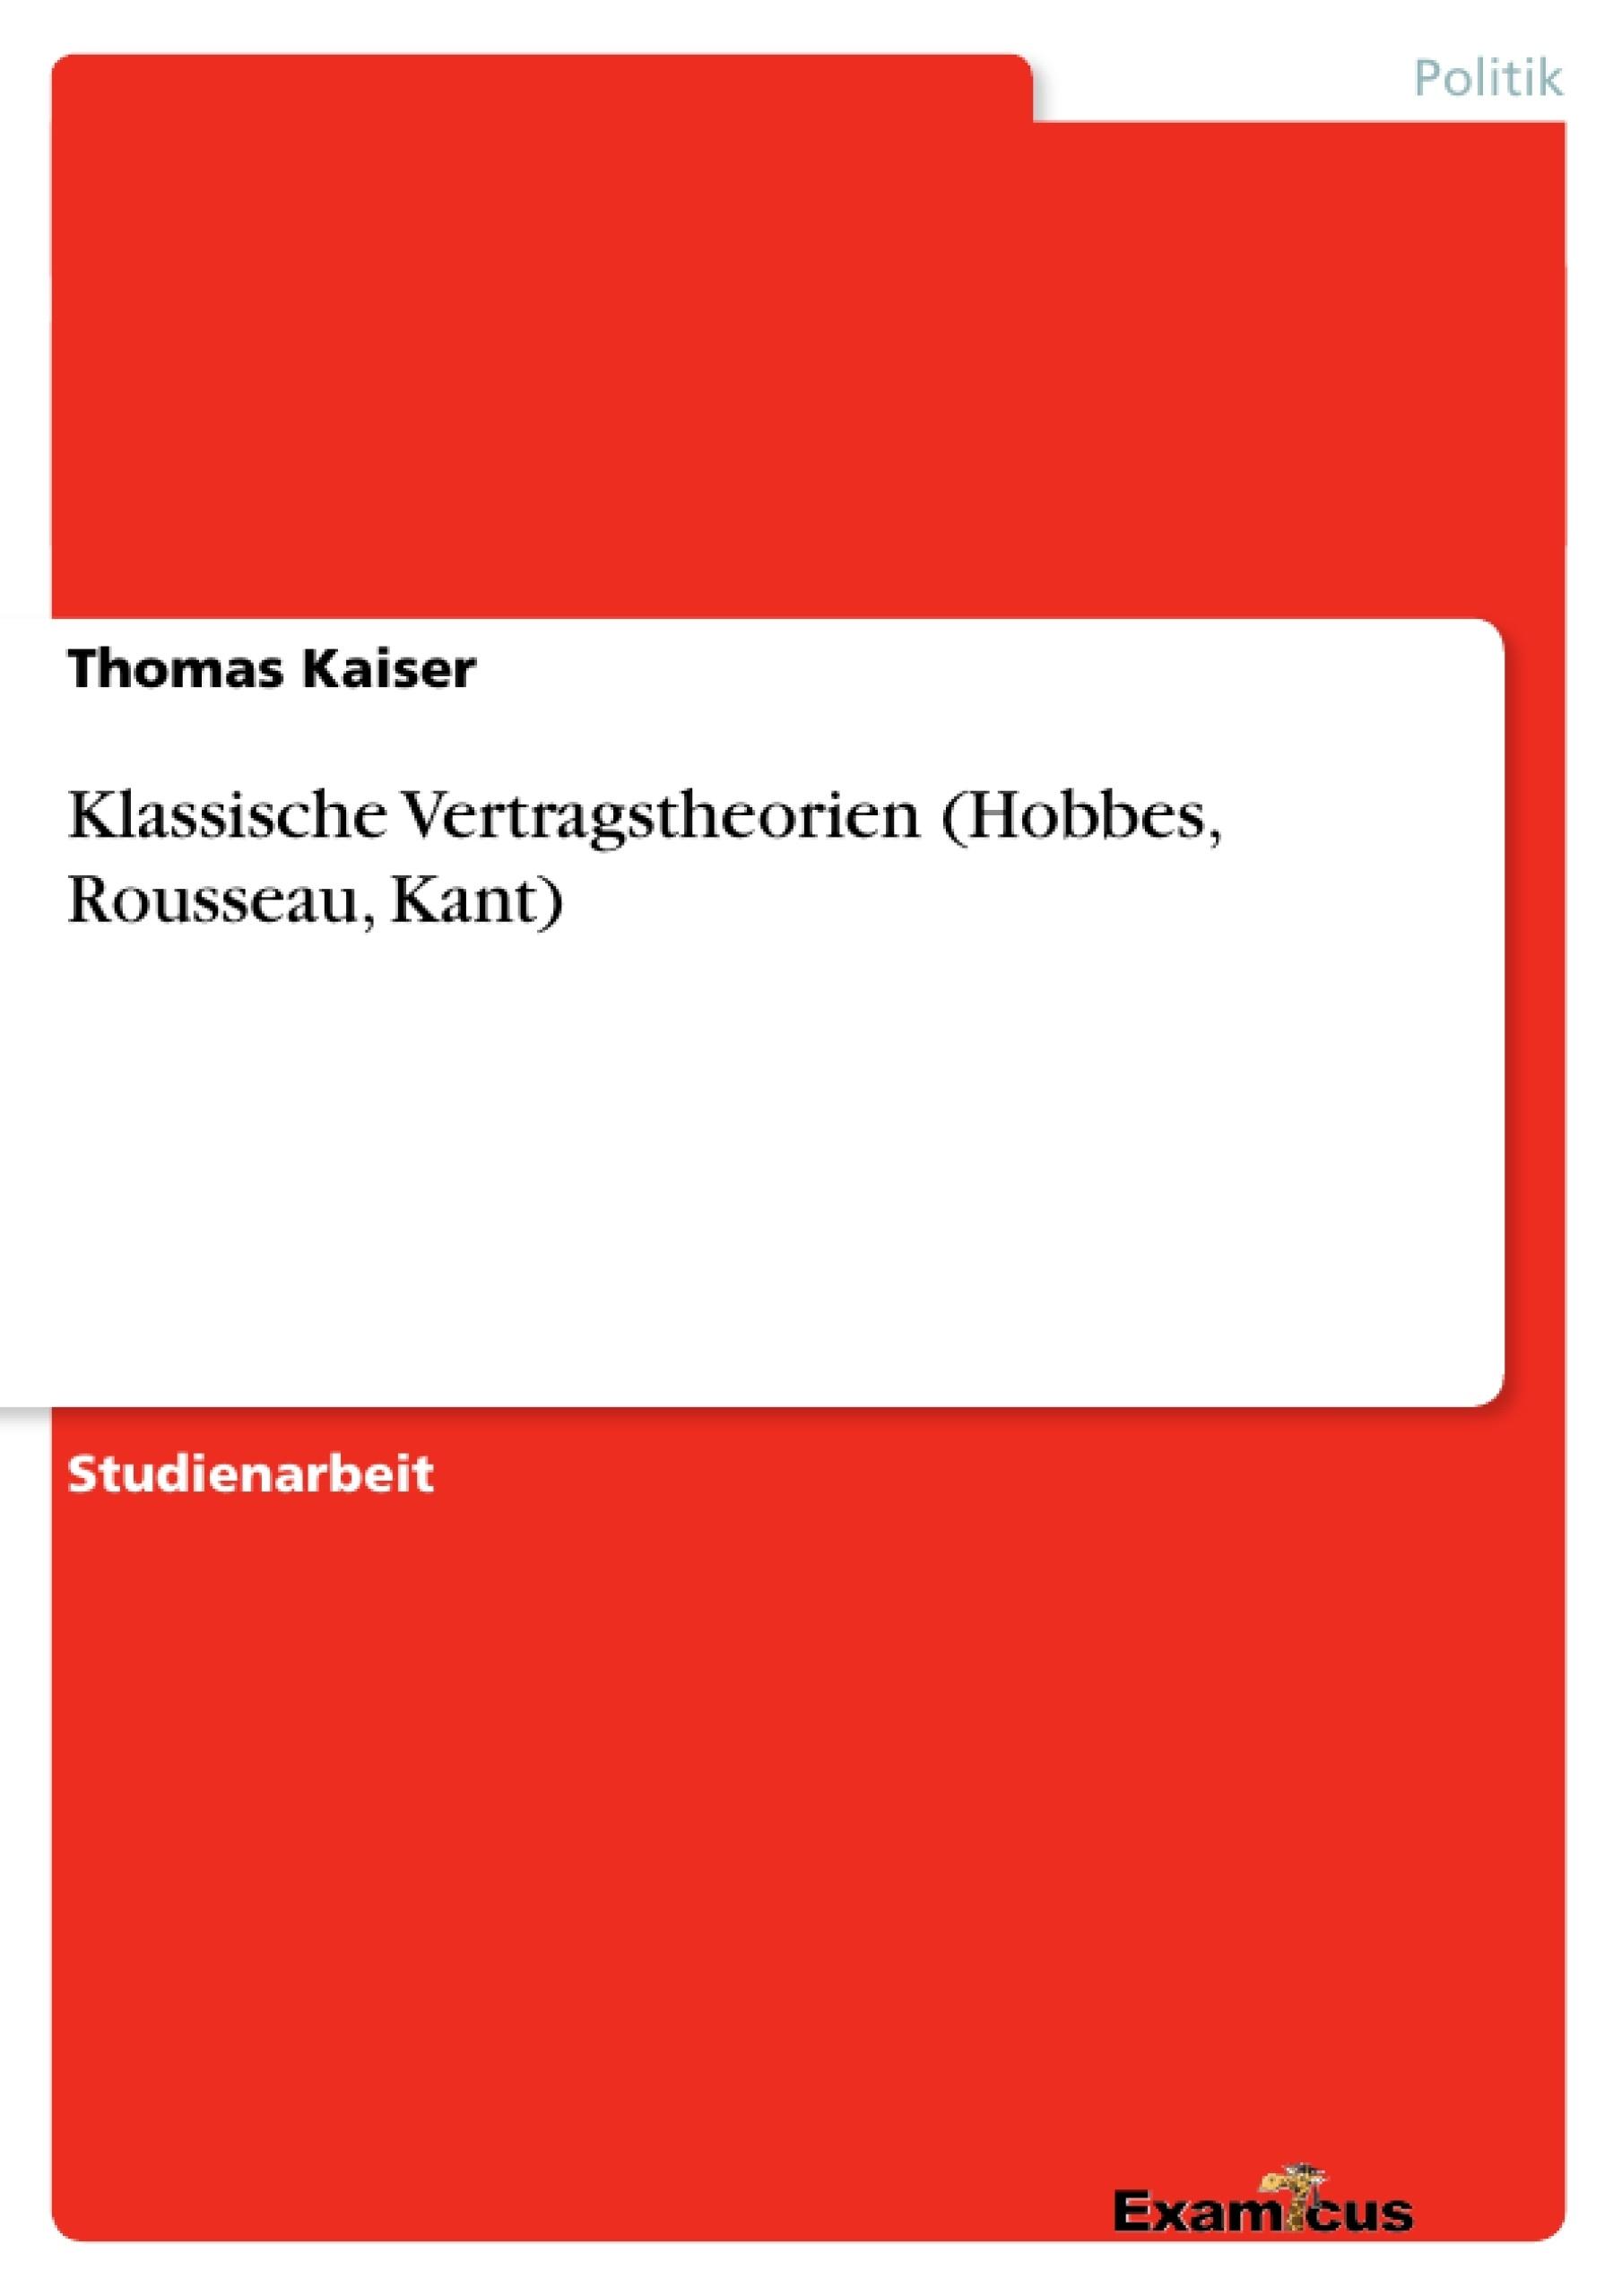 Titel: Klassische Vertragstheorien (Hobbes, Rousseau, Kant)